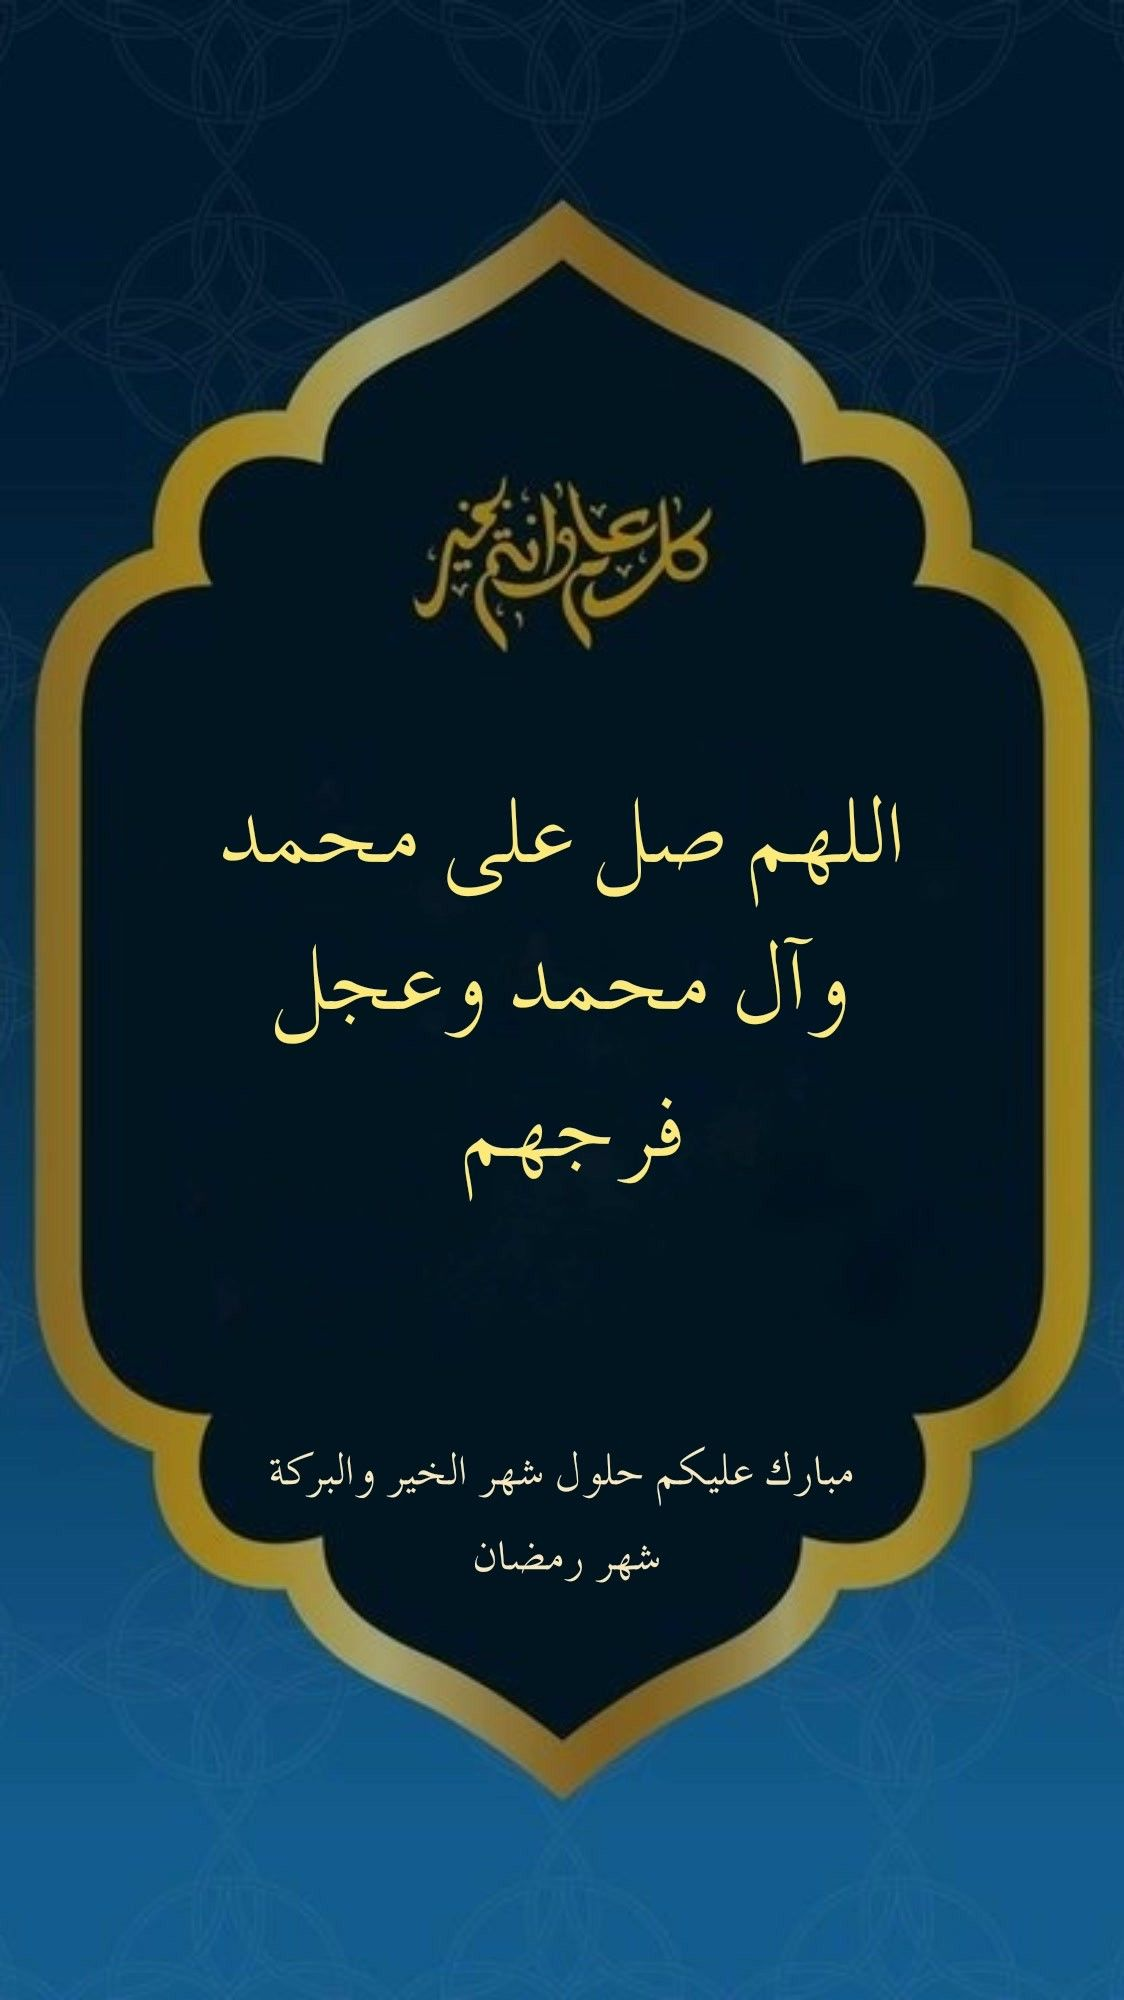 Pin By Weaam On Islamic إسلاميات Muharram Movie Posters Shia